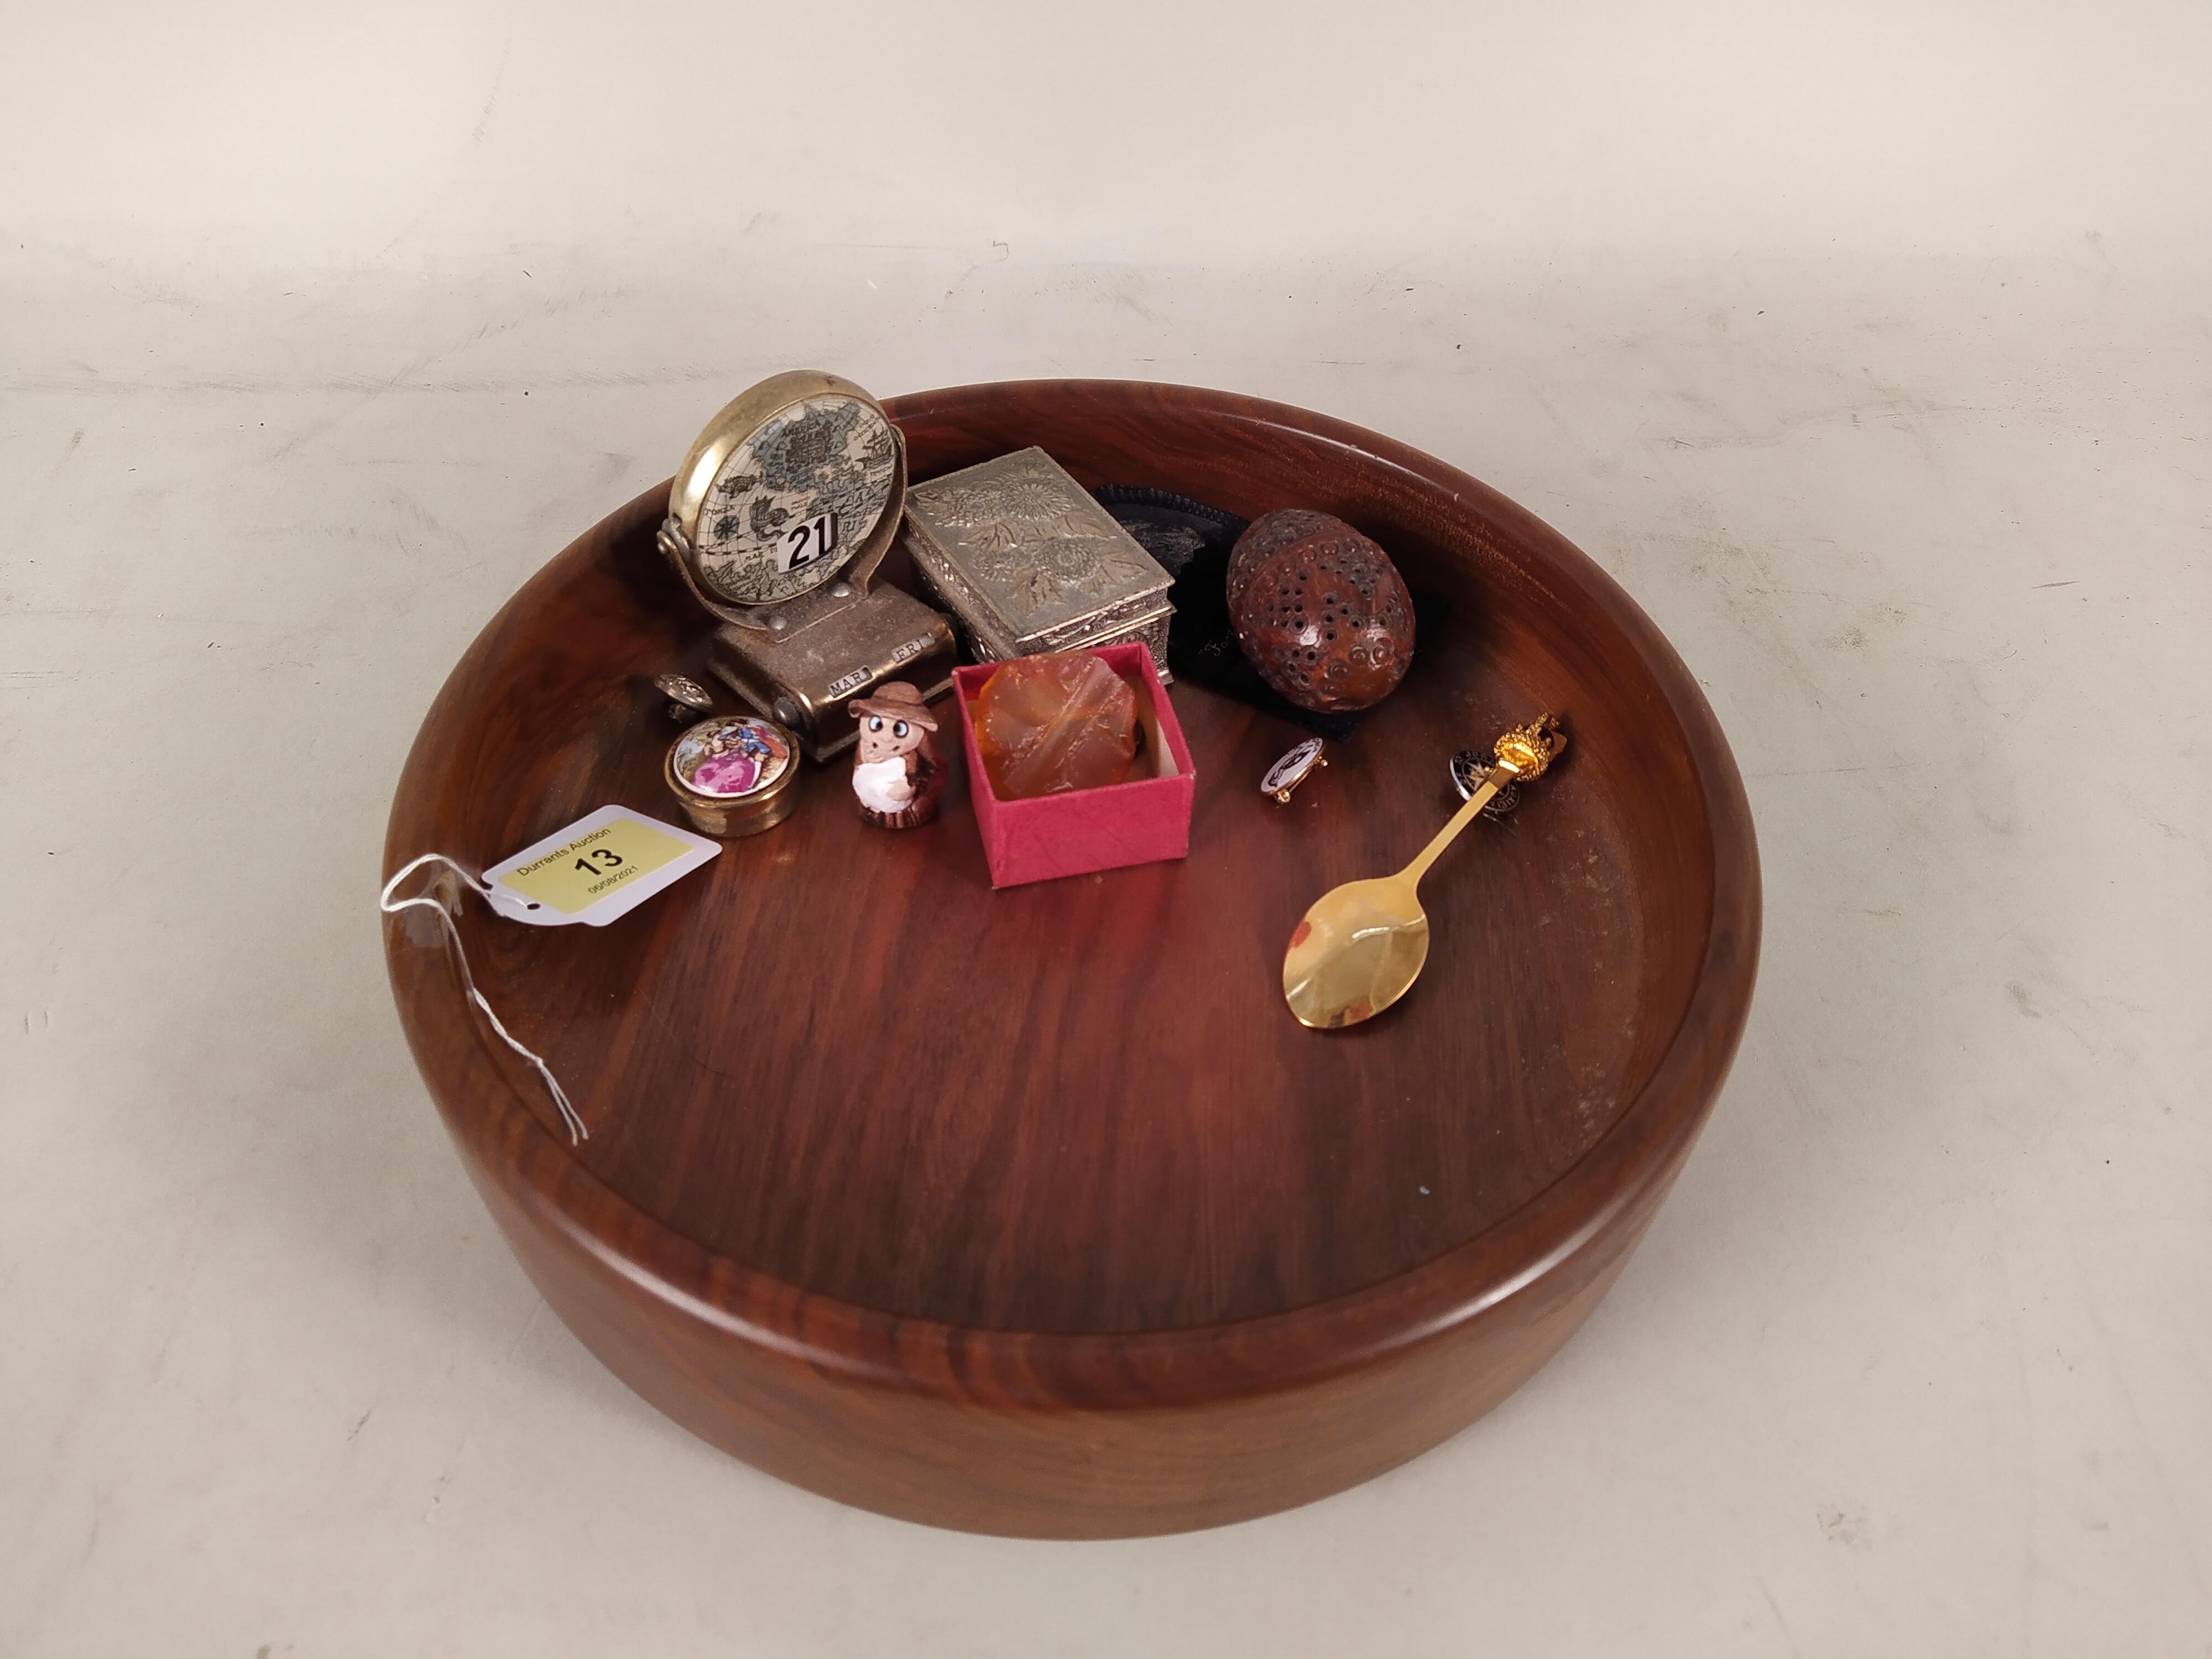 A wooden fruit bowl and contents including a desk calendar,